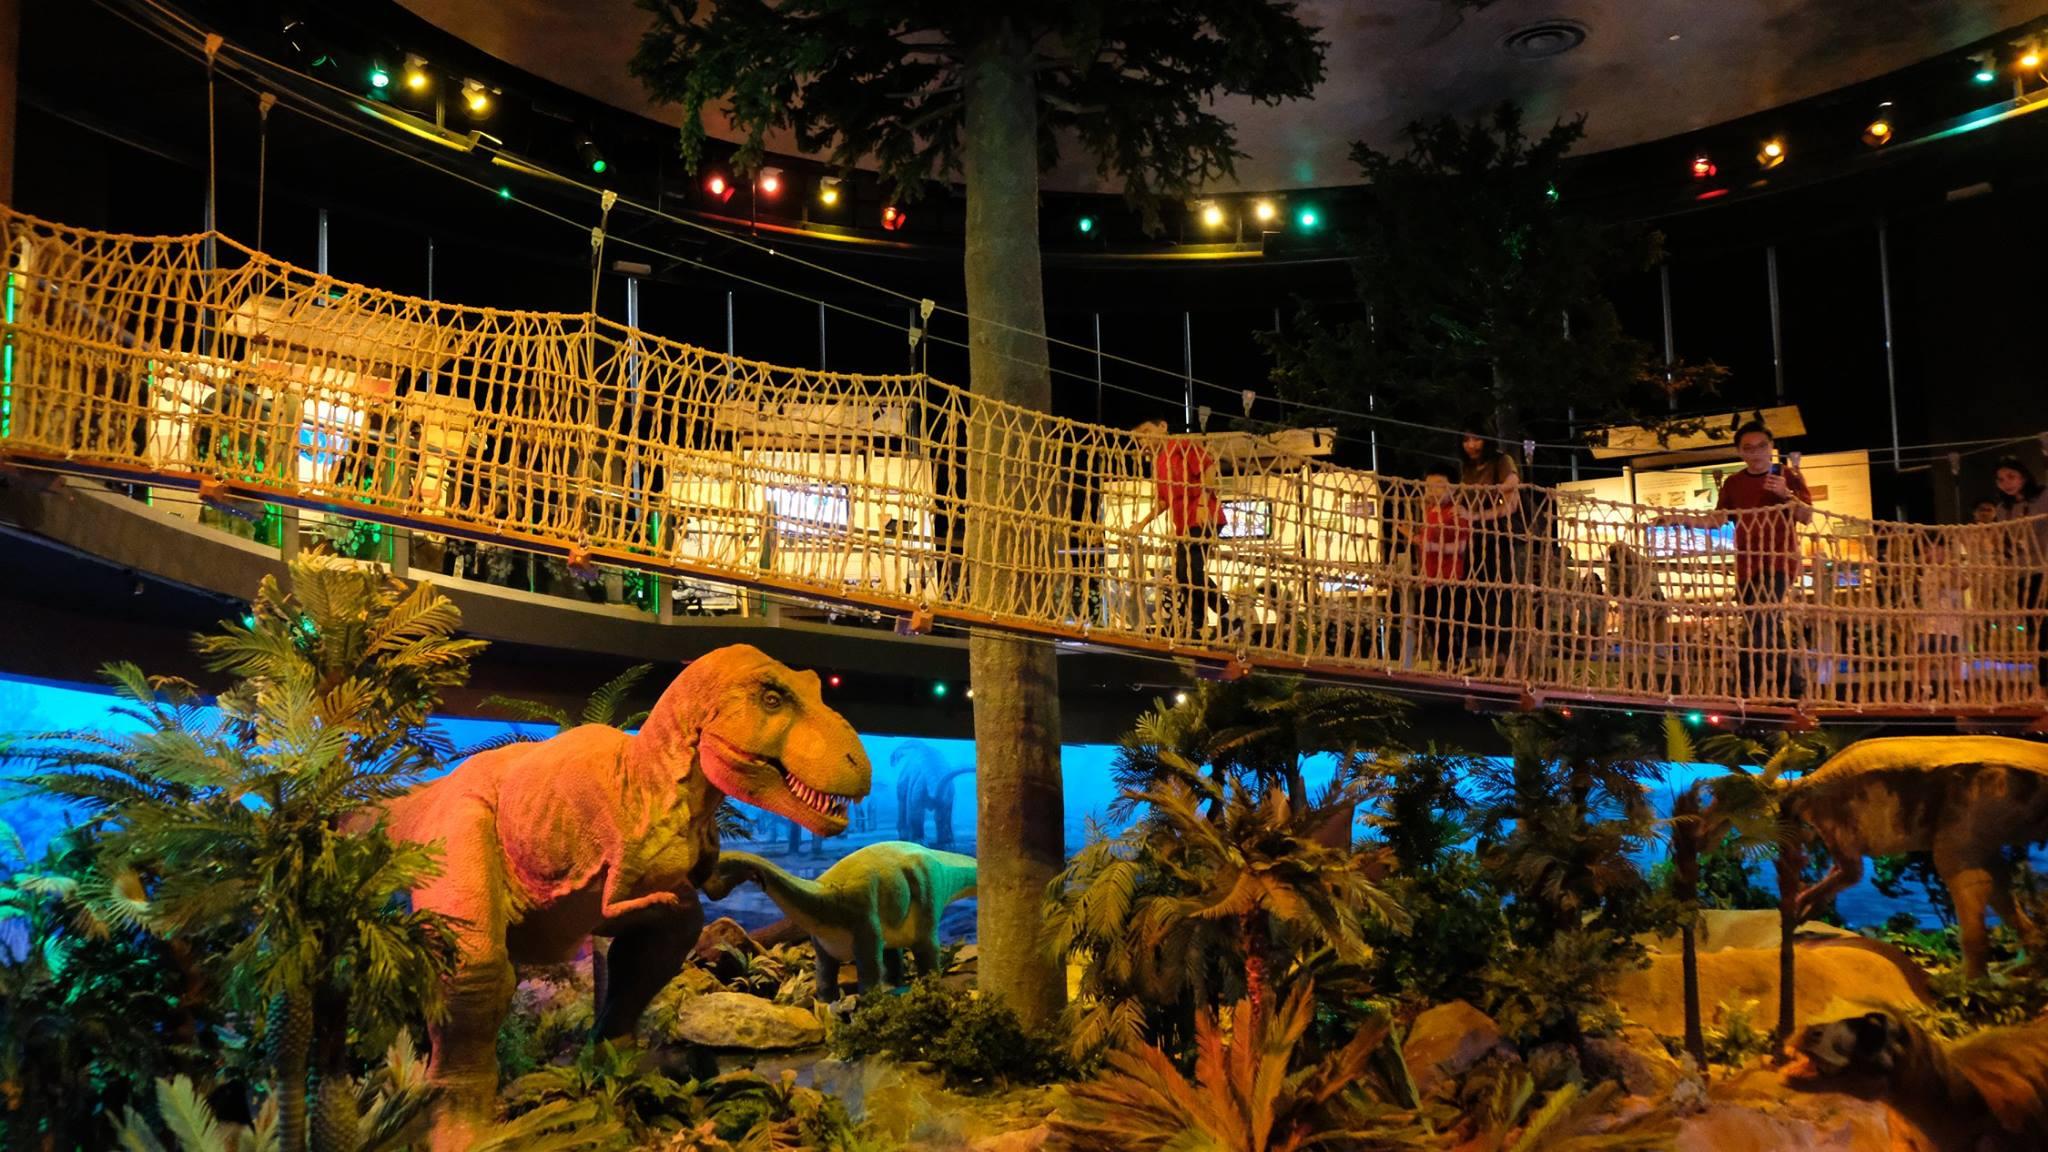 Dinosaur exhibit at Petrosains.